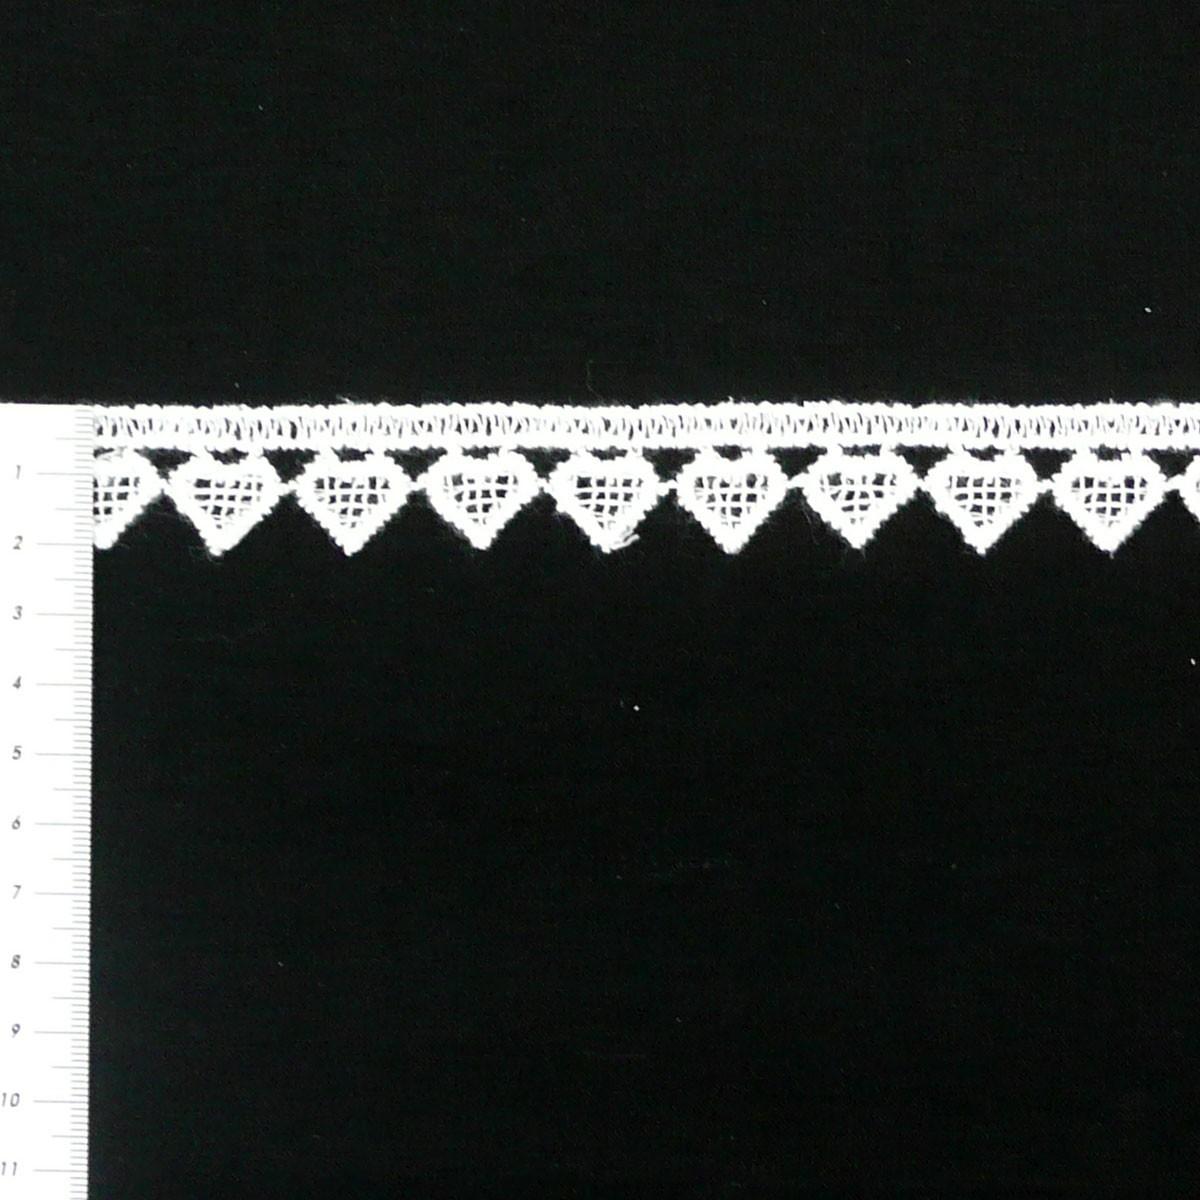 24243-Borte-Spitzenborte-weiss-Herz-Meterware-2cm.jpg